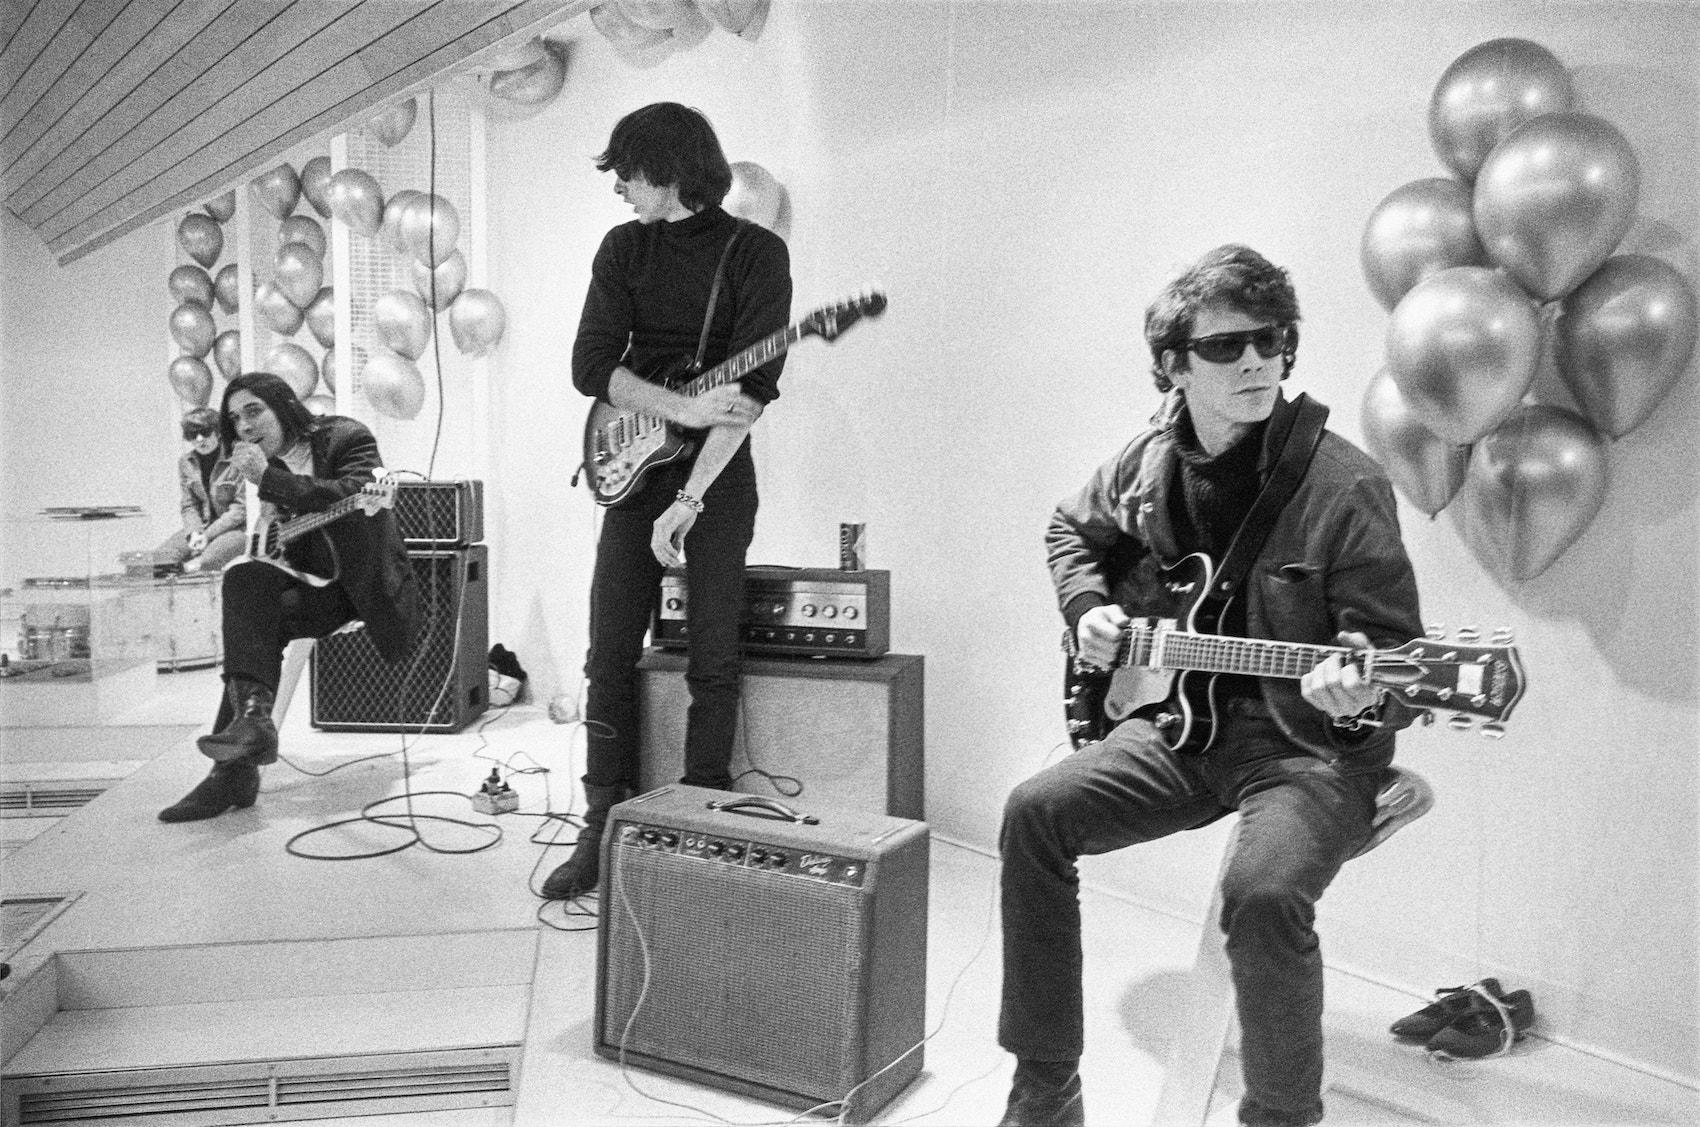 Todd Haynes' Velvet Underground Documentary Is A Vivid Portrait Of A Transformative Band